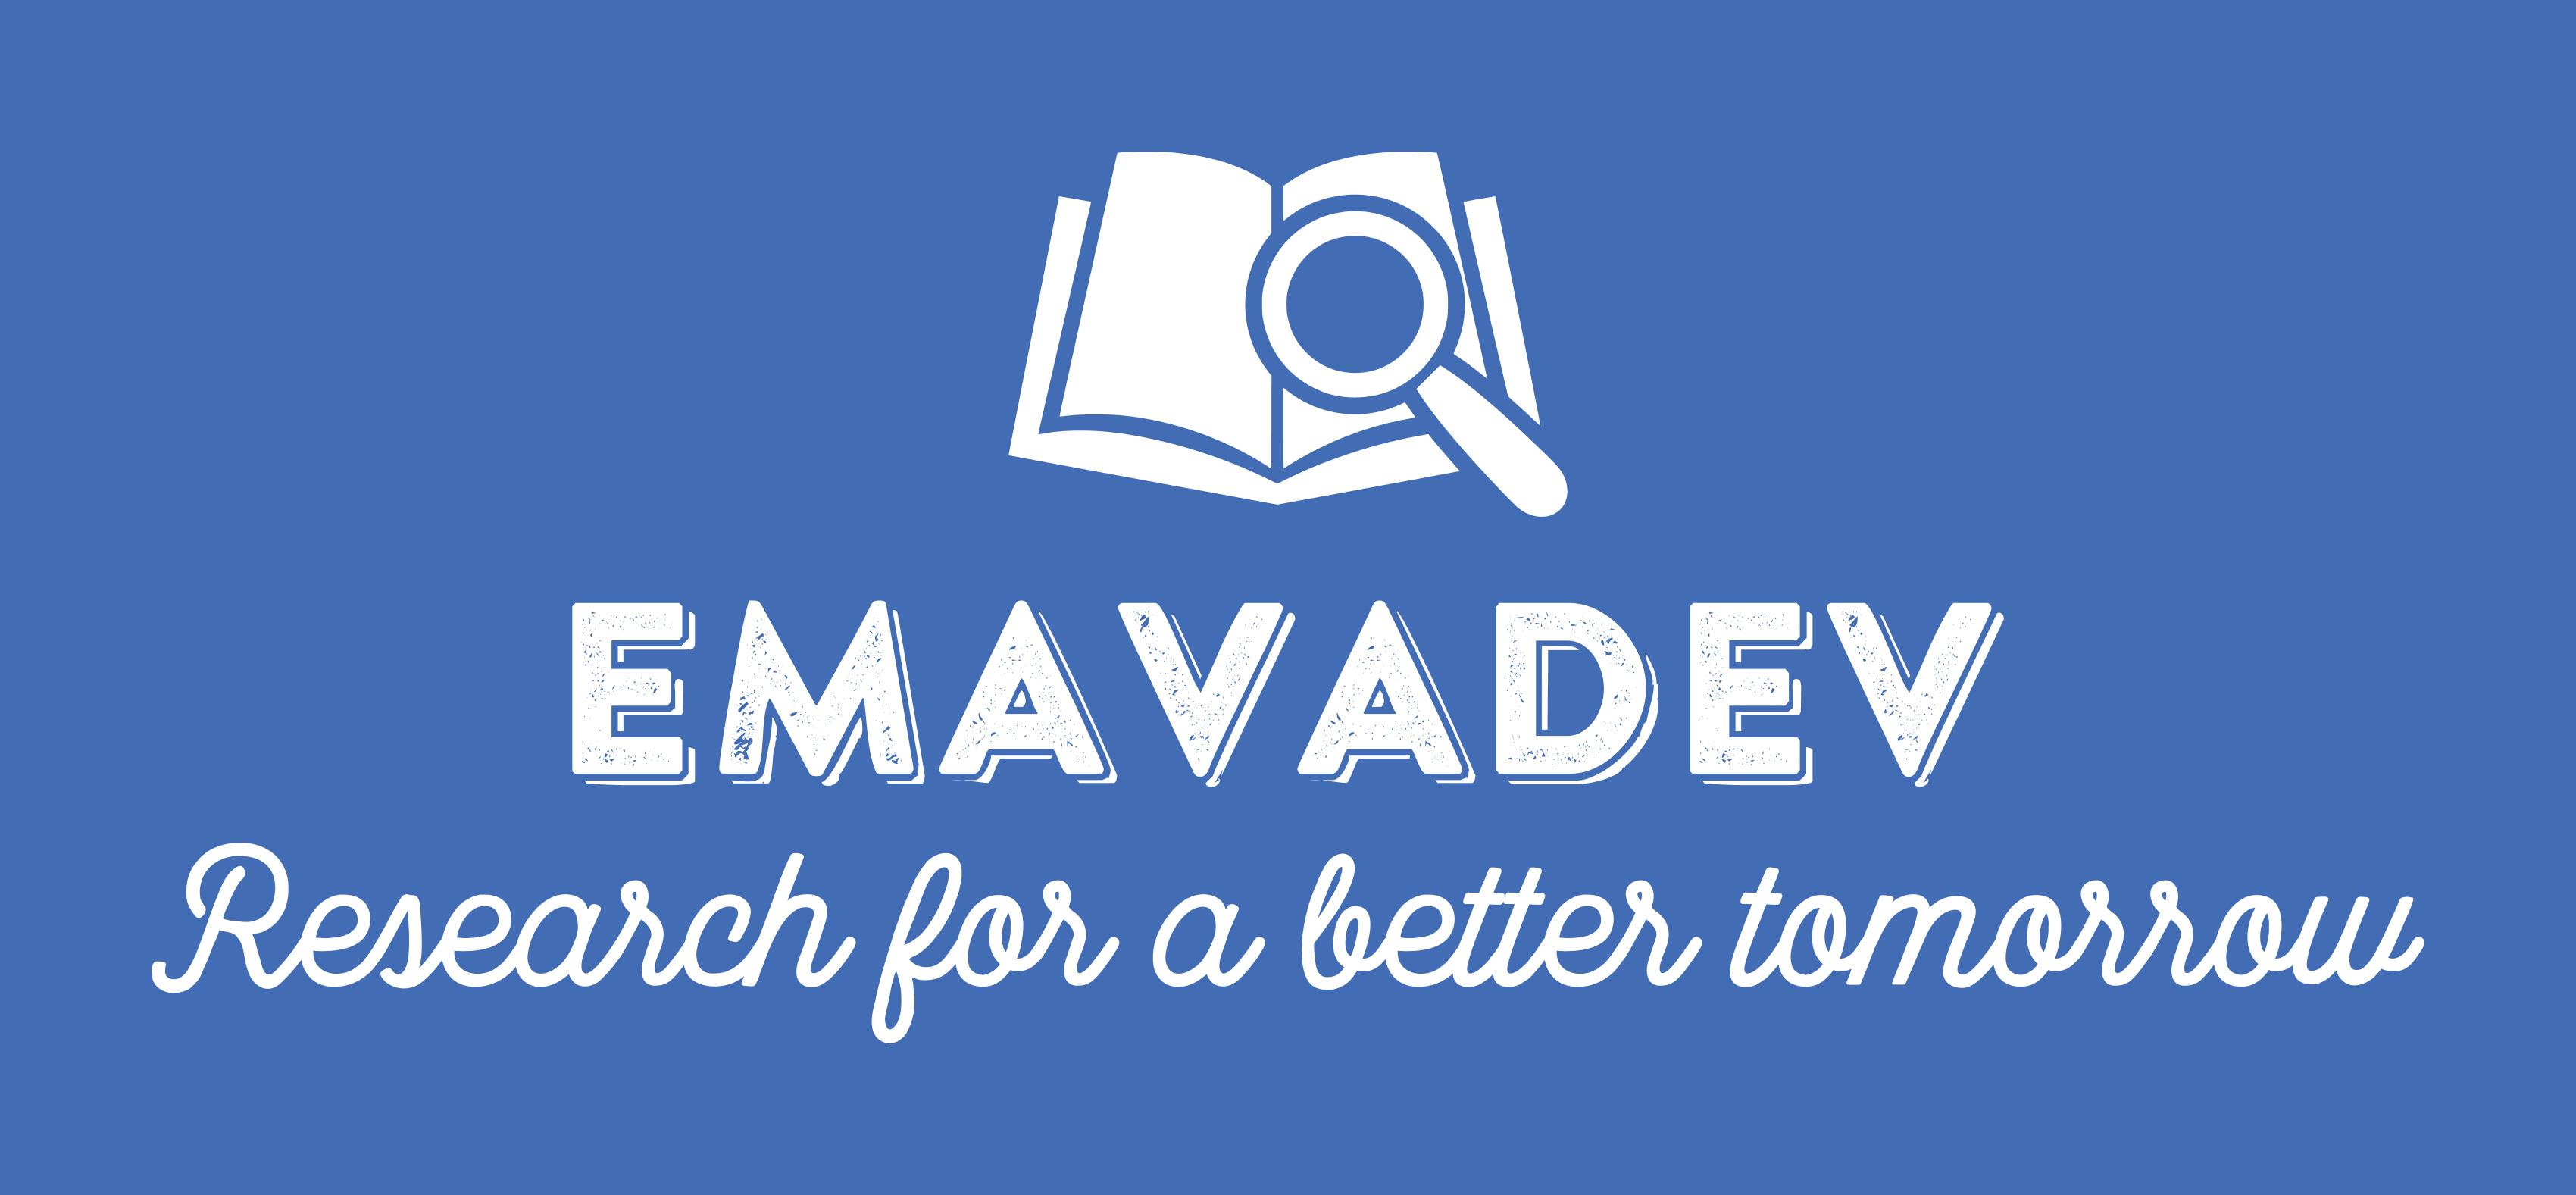 EMAVADEV PUBLISHERS PVT LTD